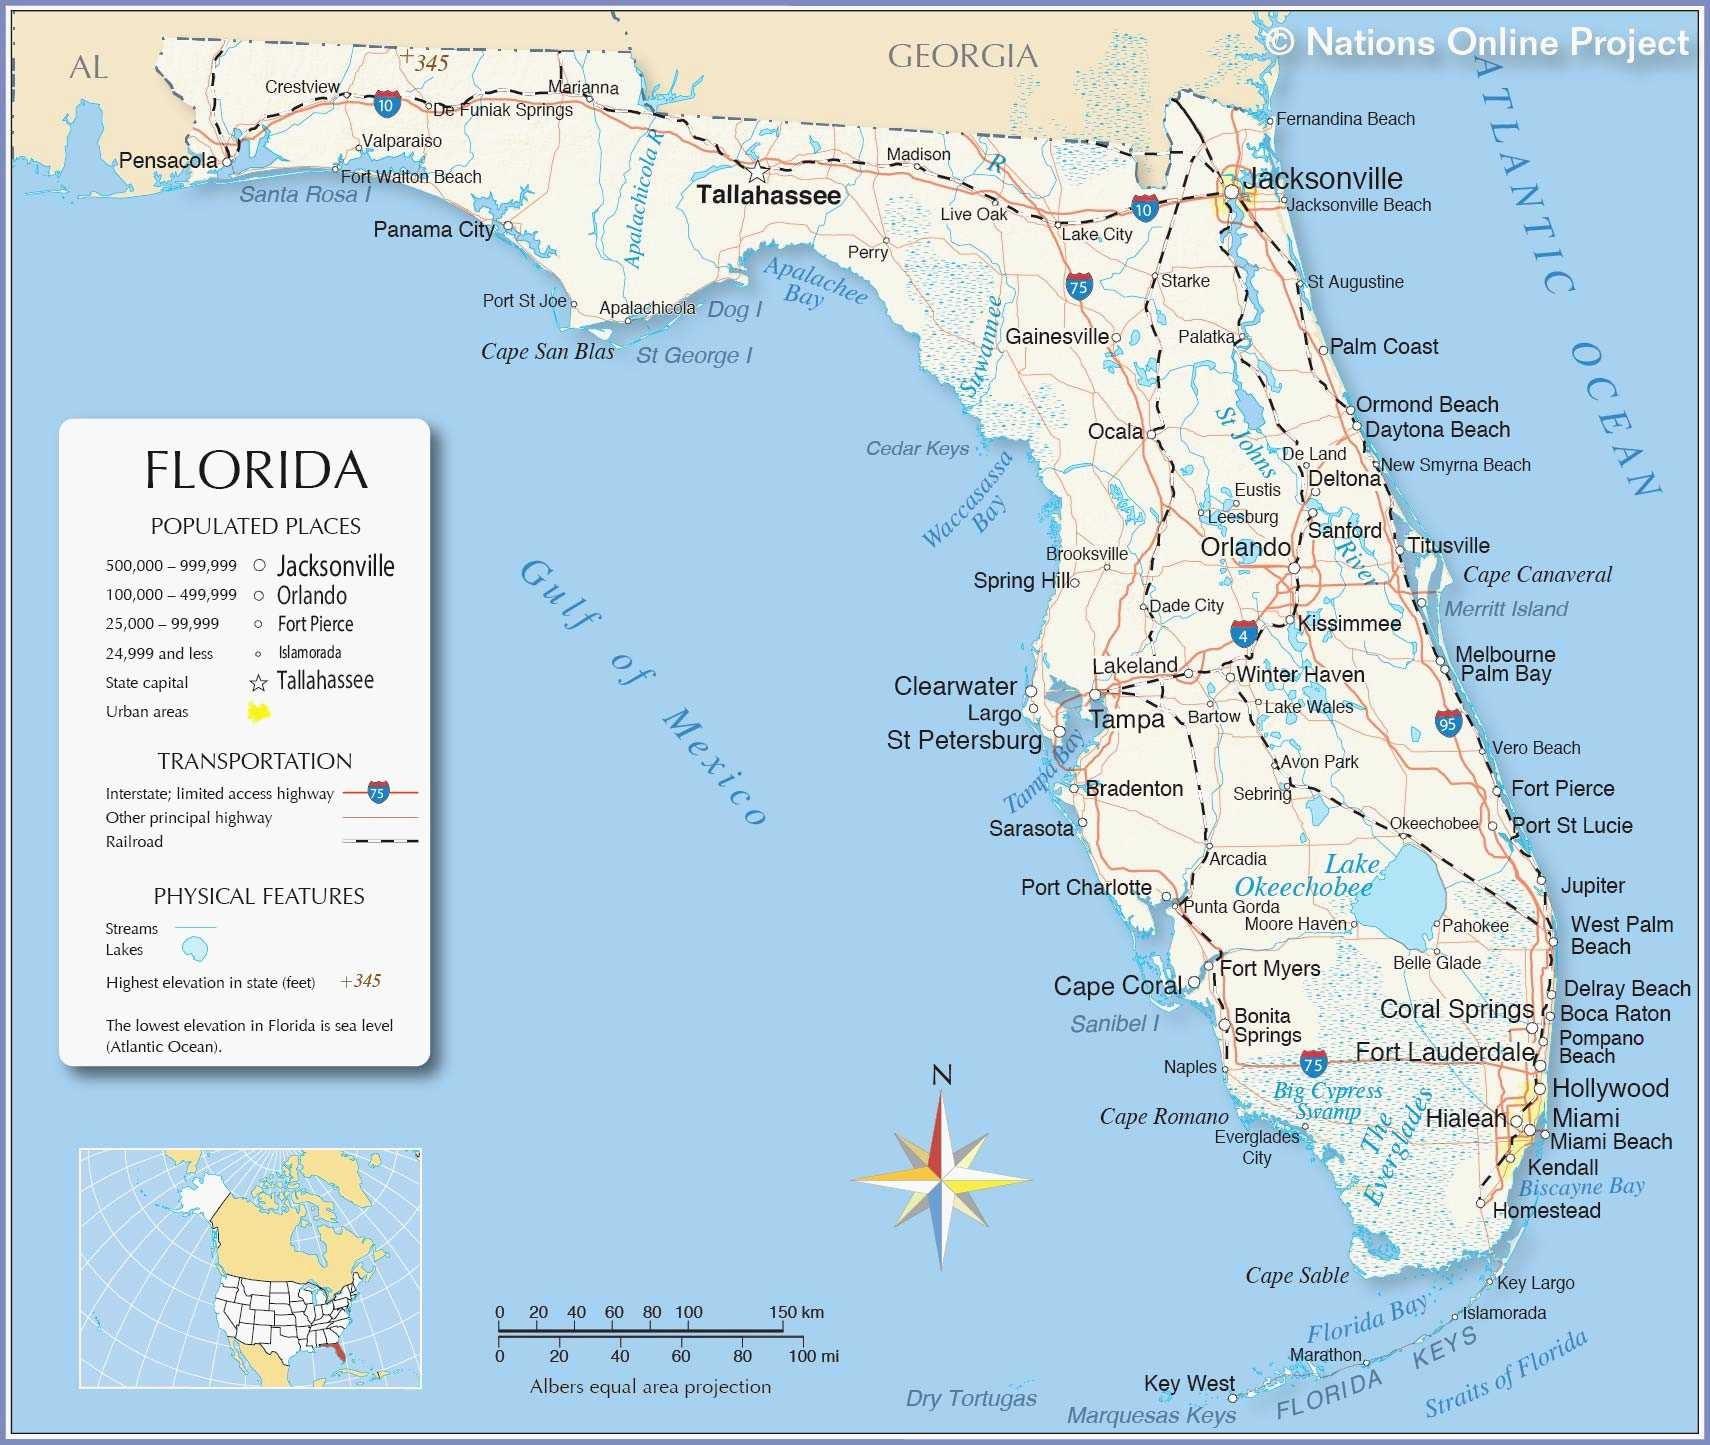 United States Map Orlando Florida Valid Great Clearwater Beach - Panama City Florida Map Google